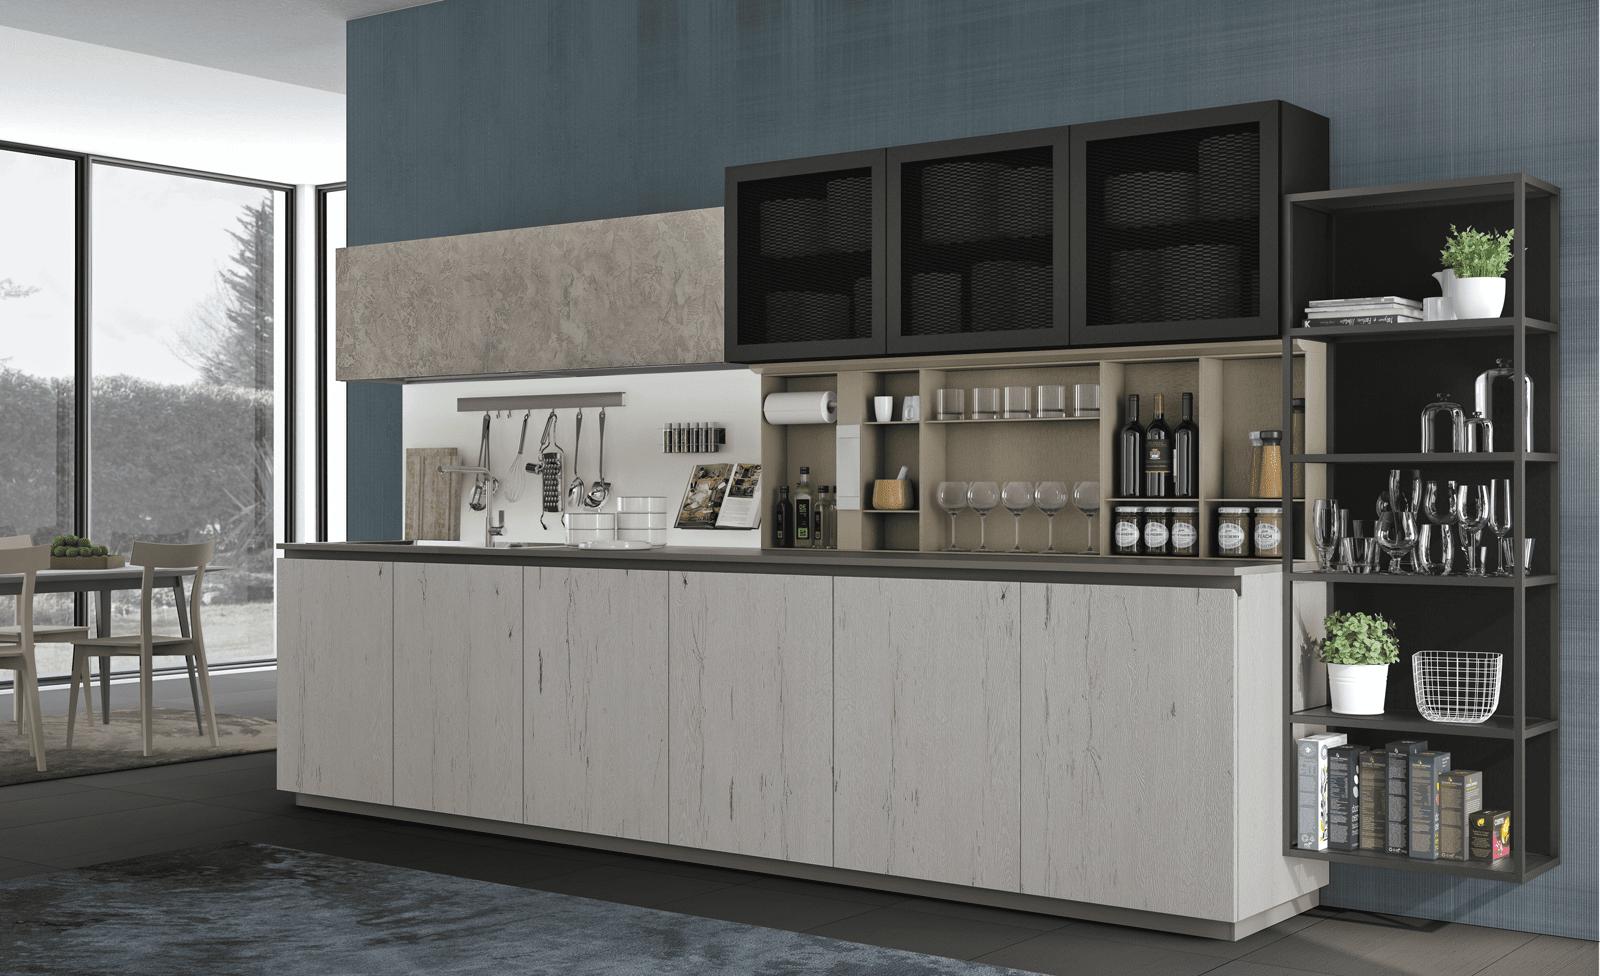 Cucina Con Boiserie : Boiserie attrezzate per le cucine cose di casa